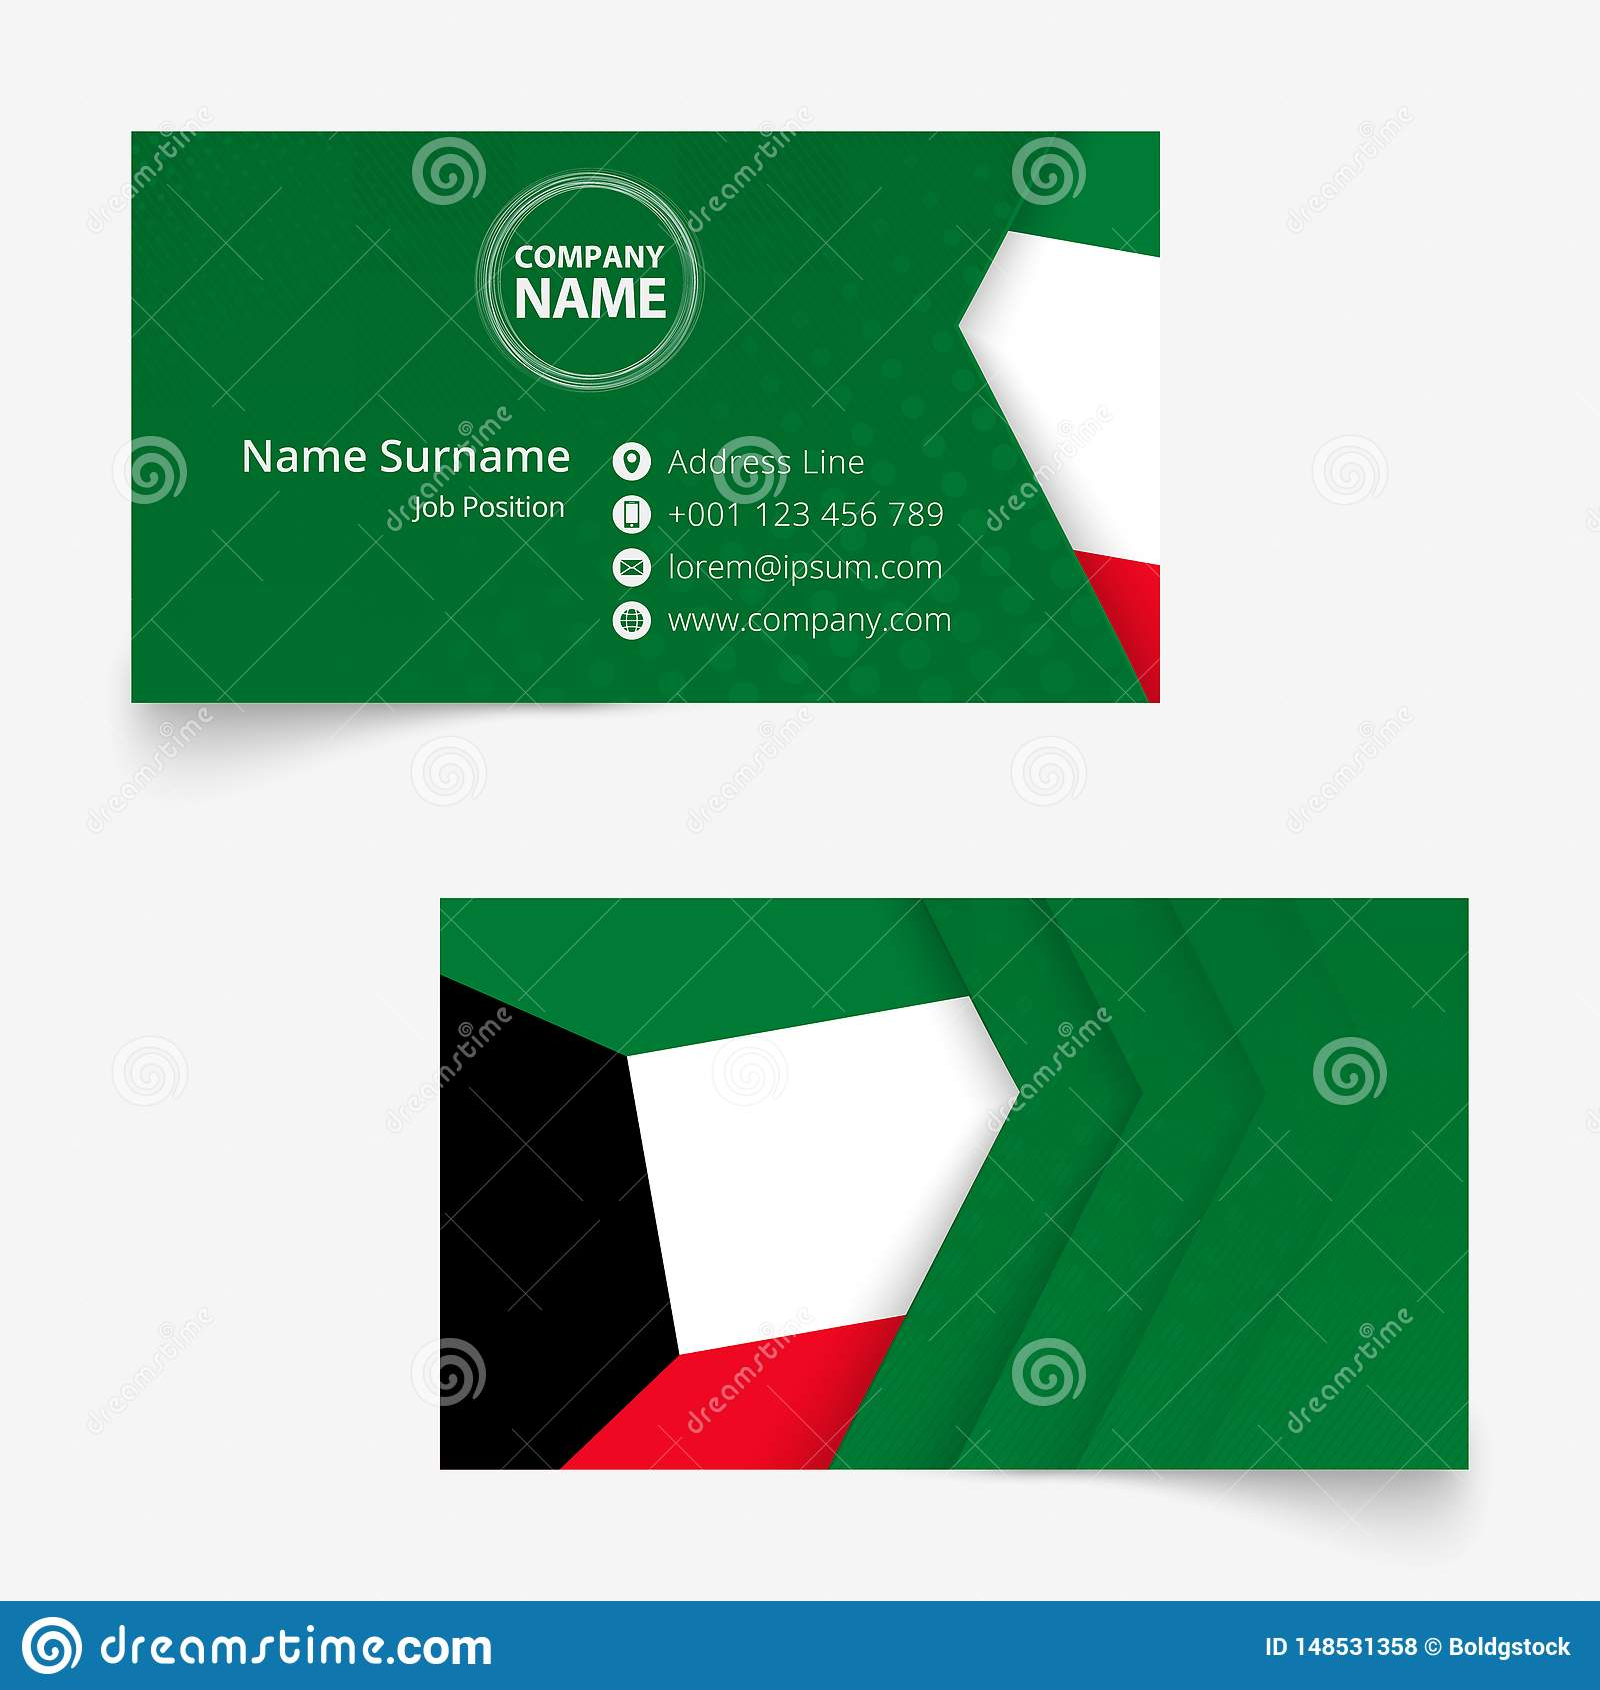 Kuwait Flag Business Card, Standard Size 90x50 Mm Business